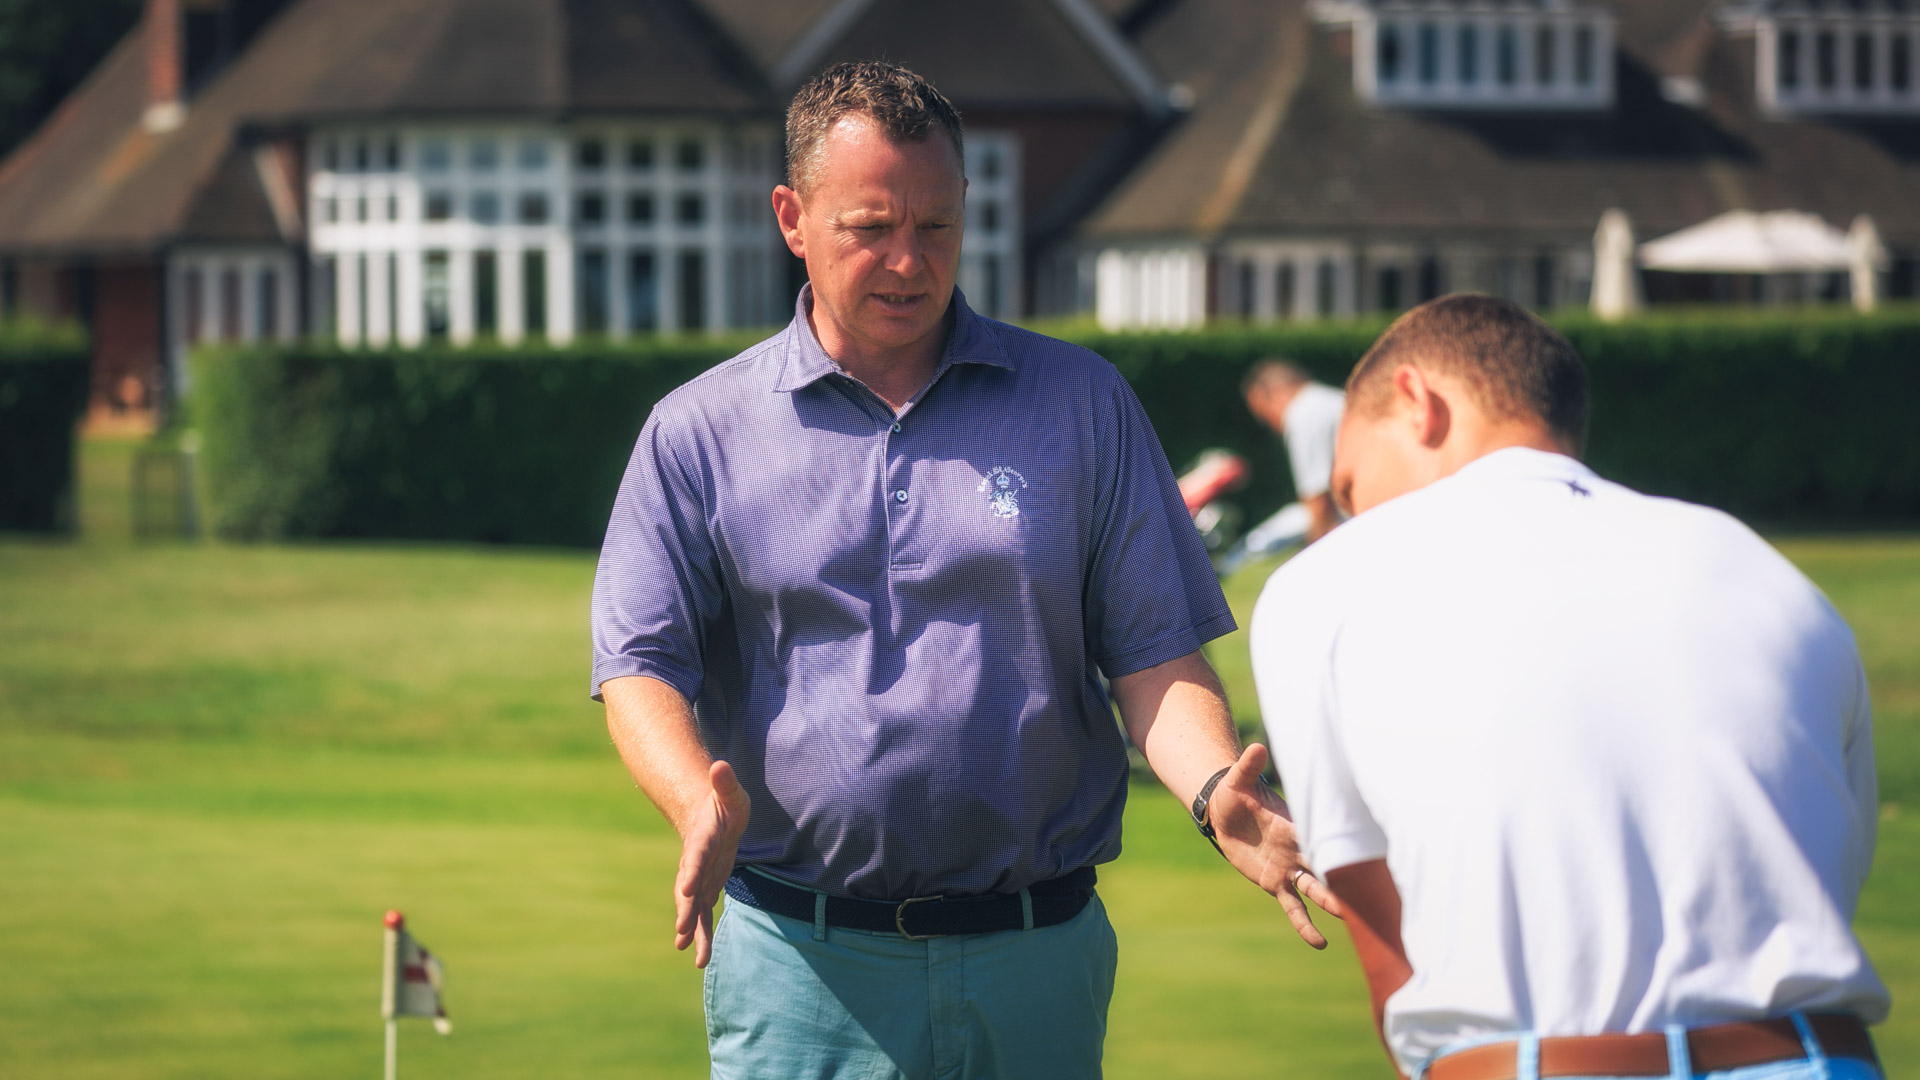 Professional-Royal-St-Georges-Golf-Club0097